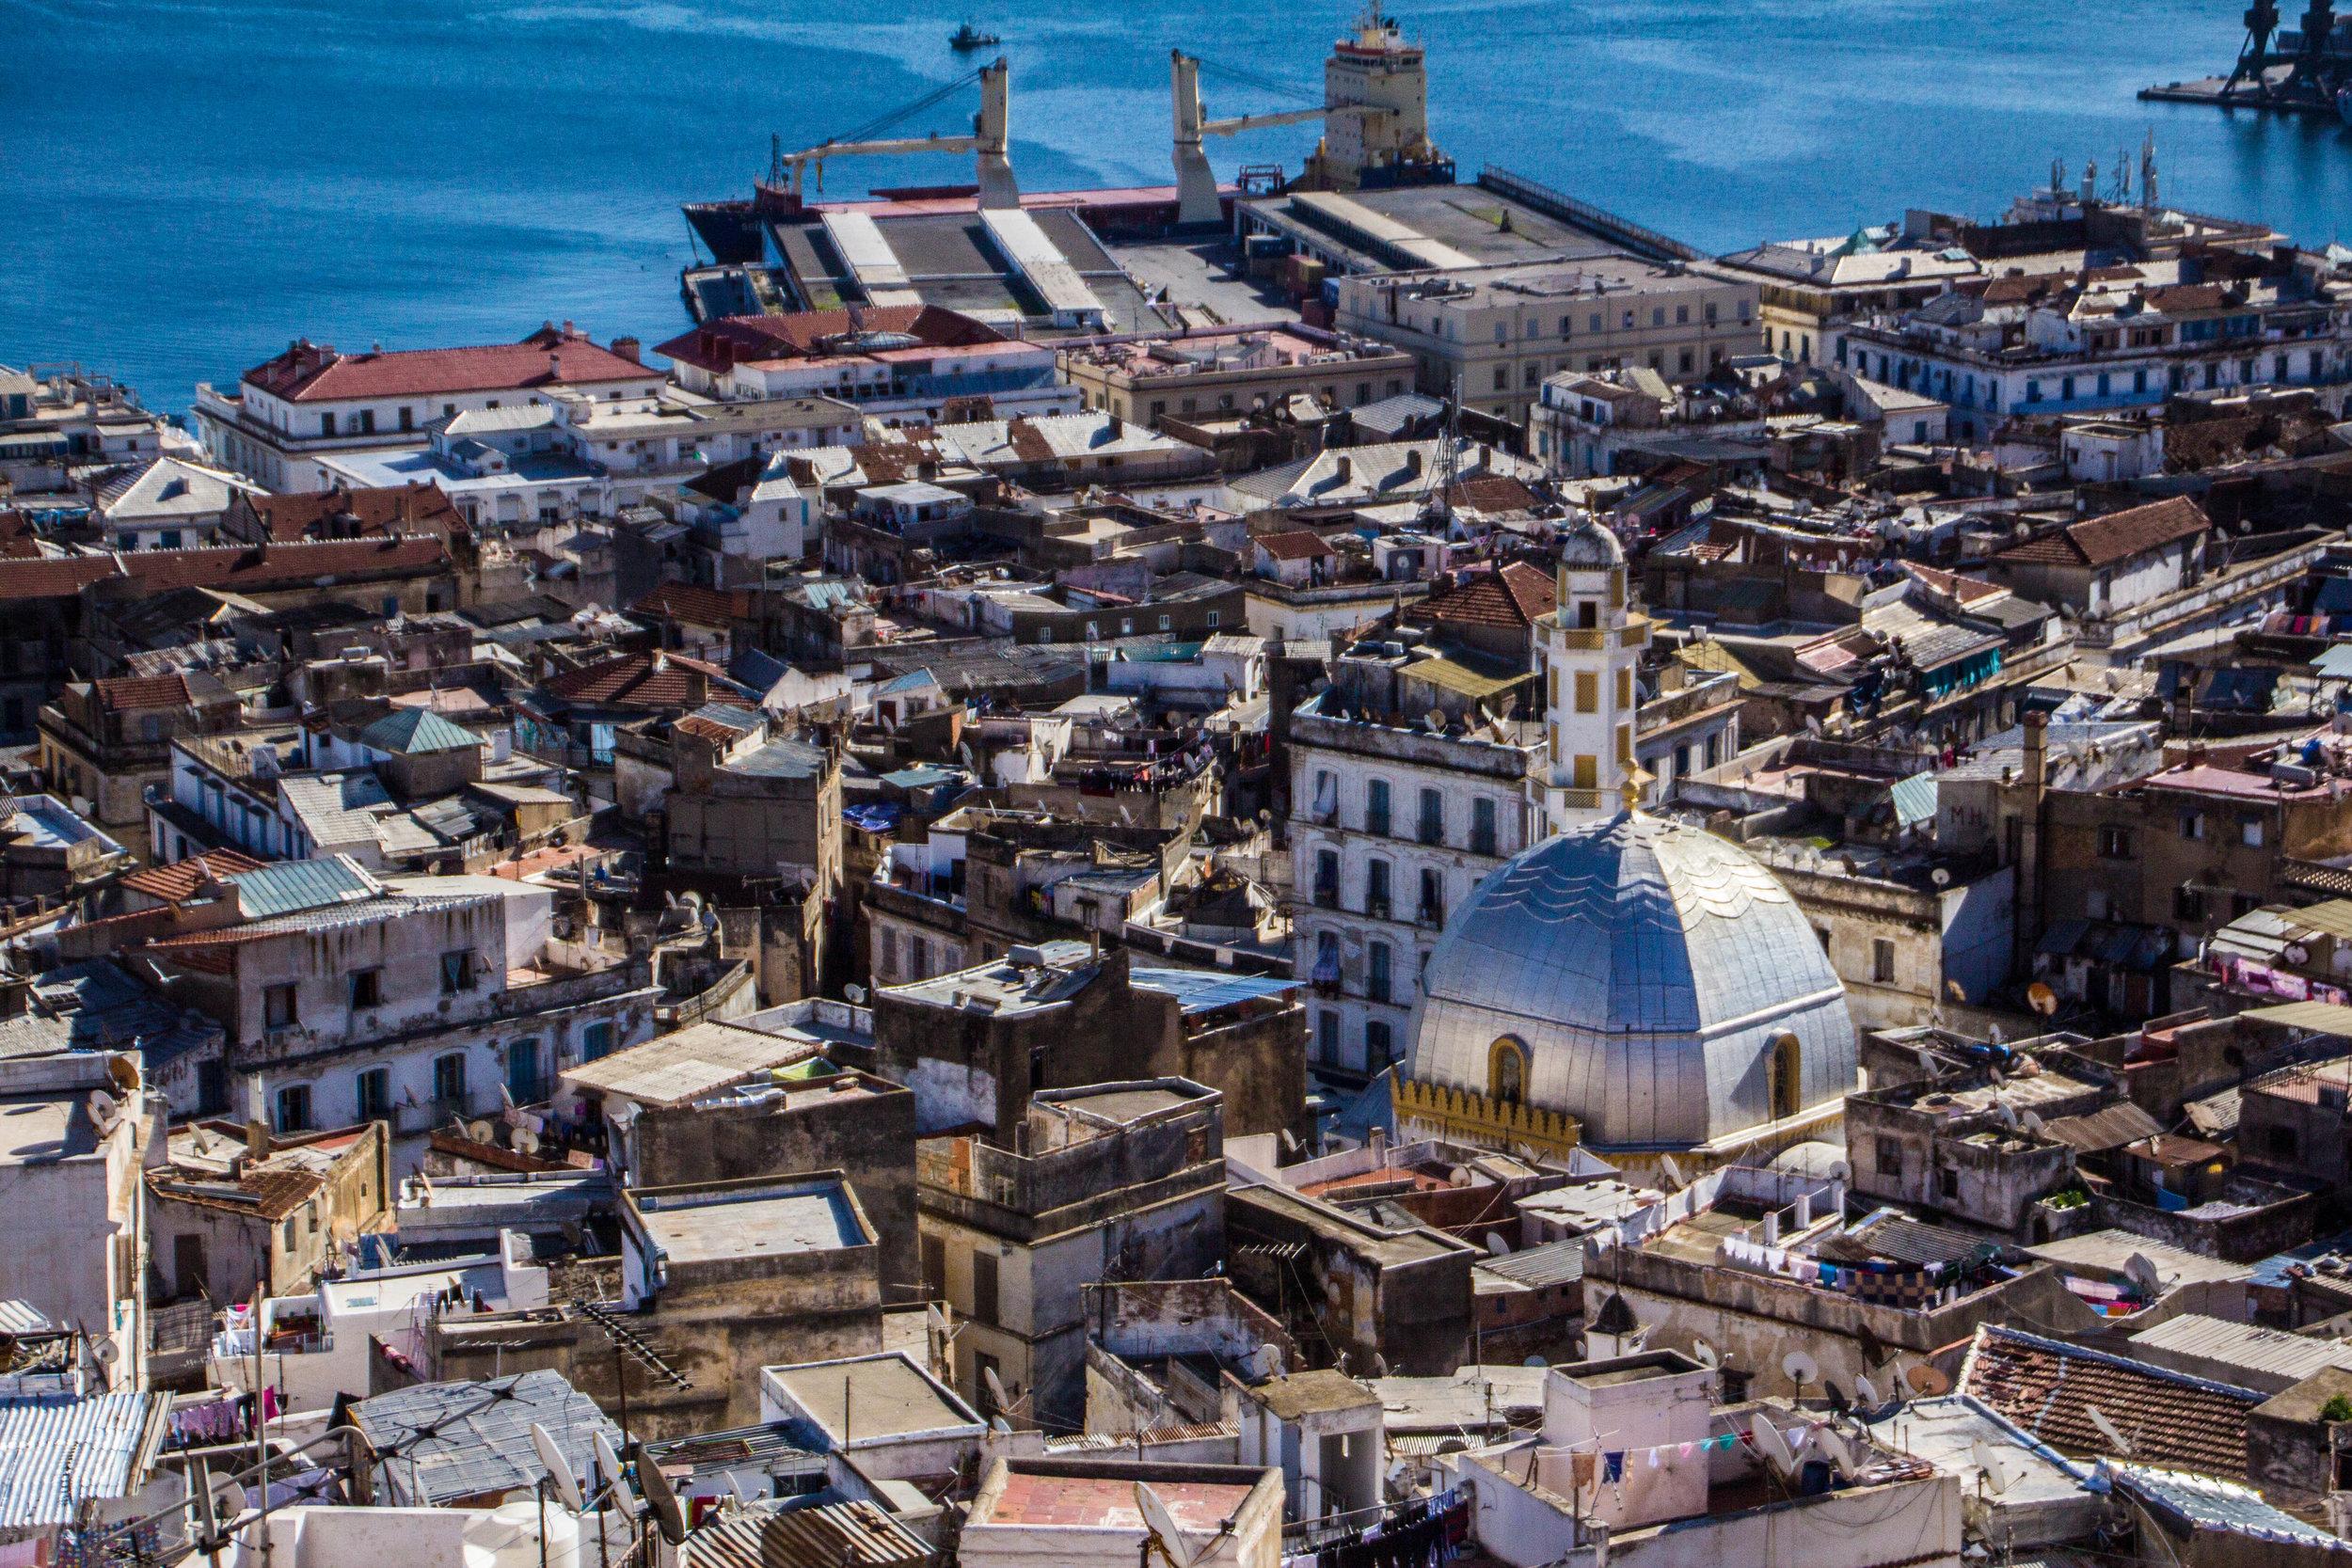 casbah-from-above-algiers-algeria-6.jpg